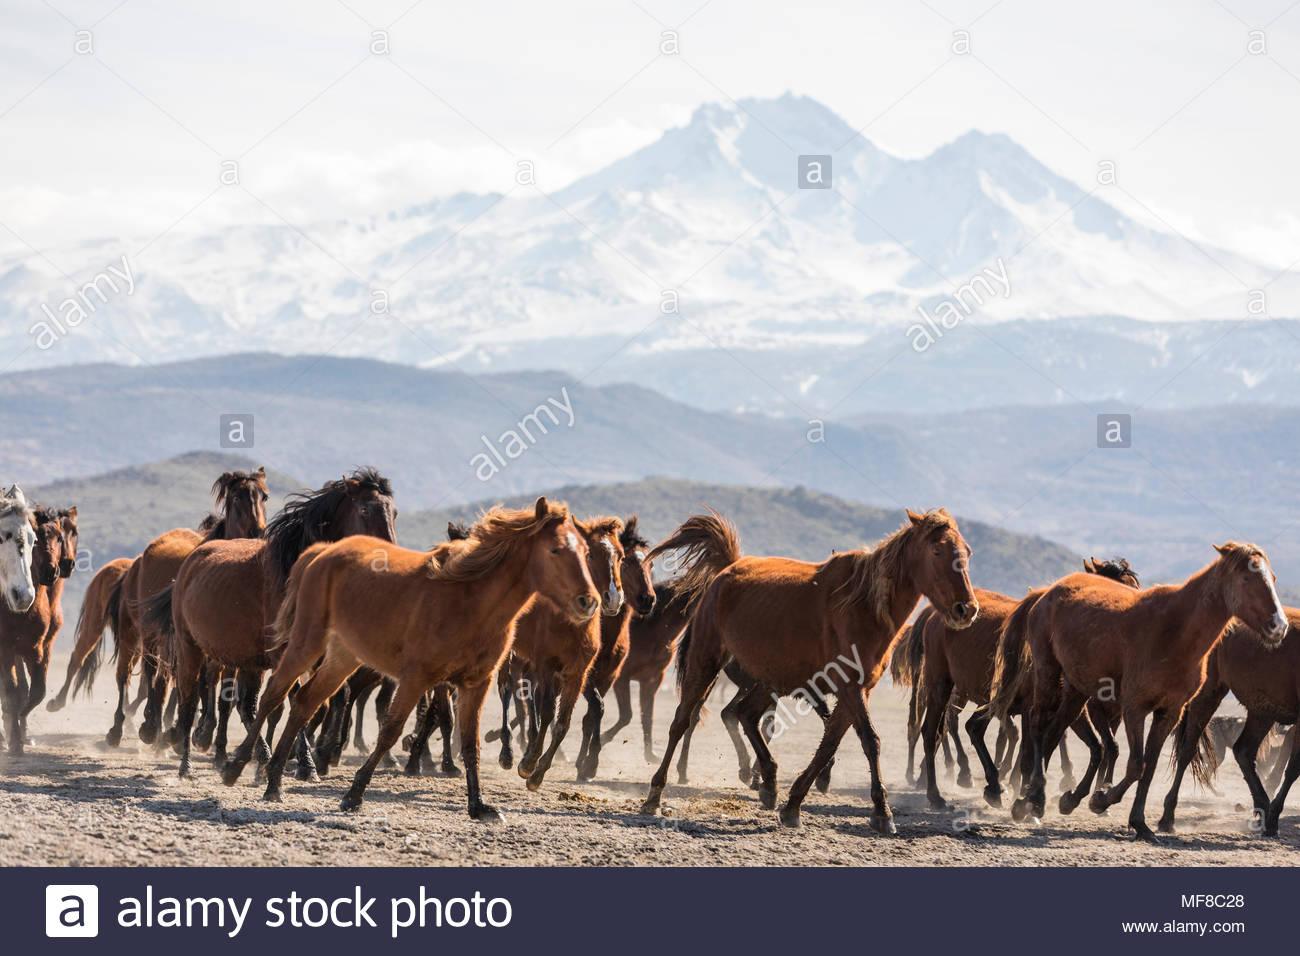 Wild Yılkı Horses In Nature - Stock Image